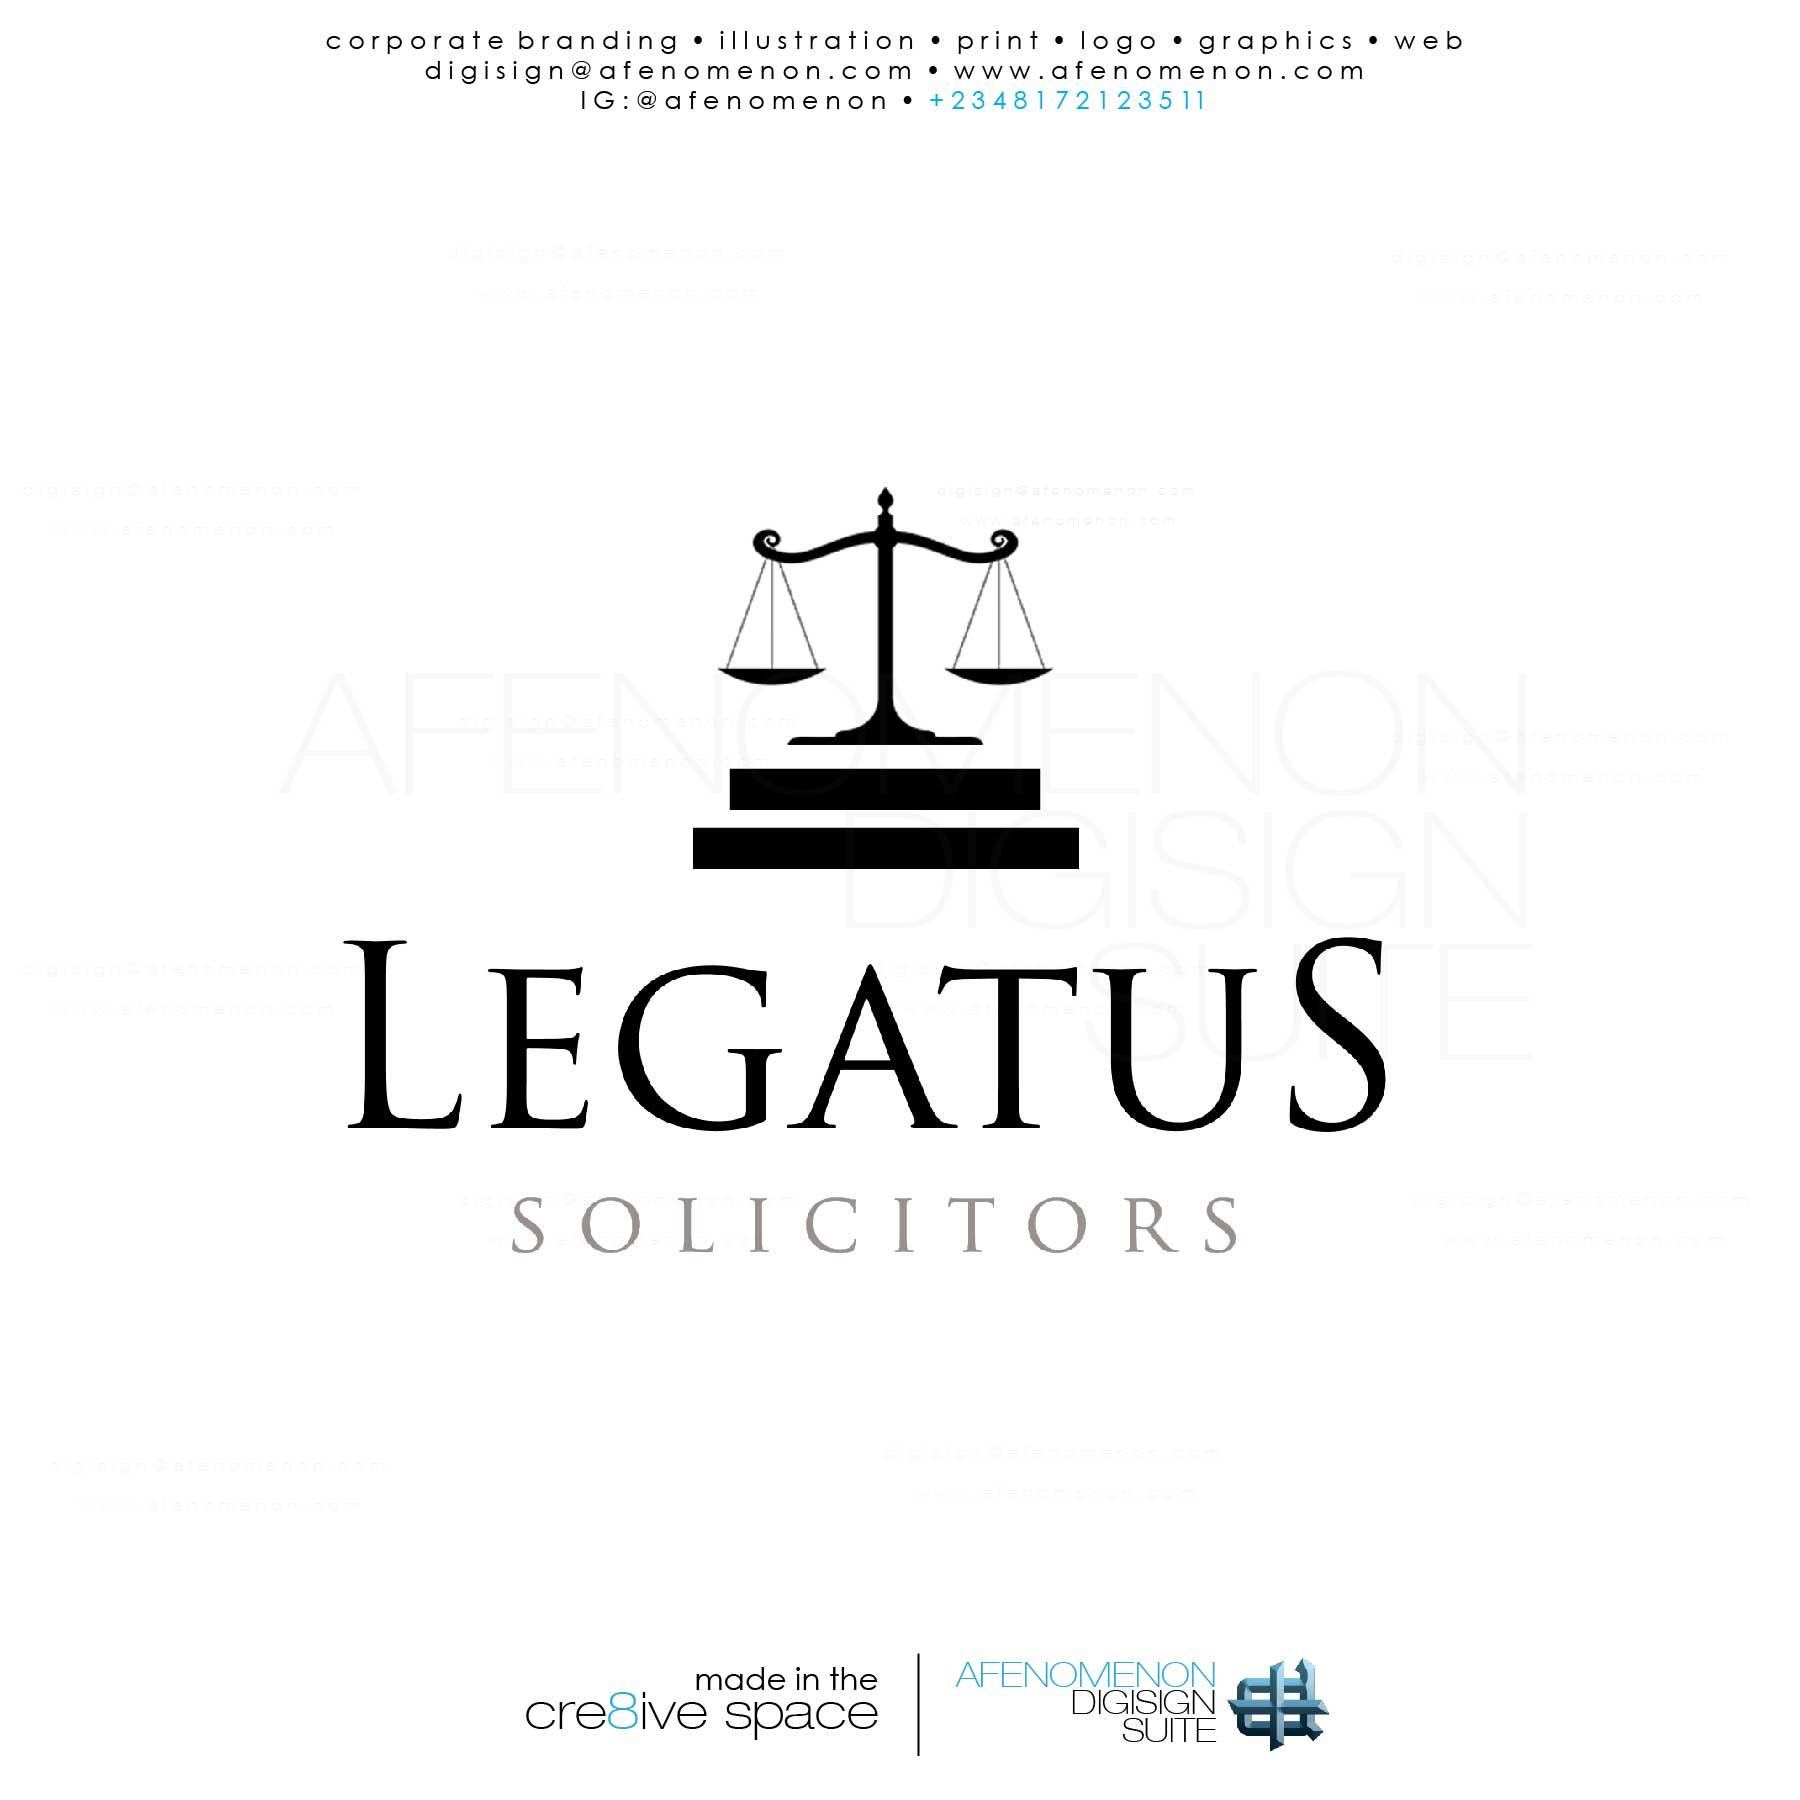 Legatus.jpg